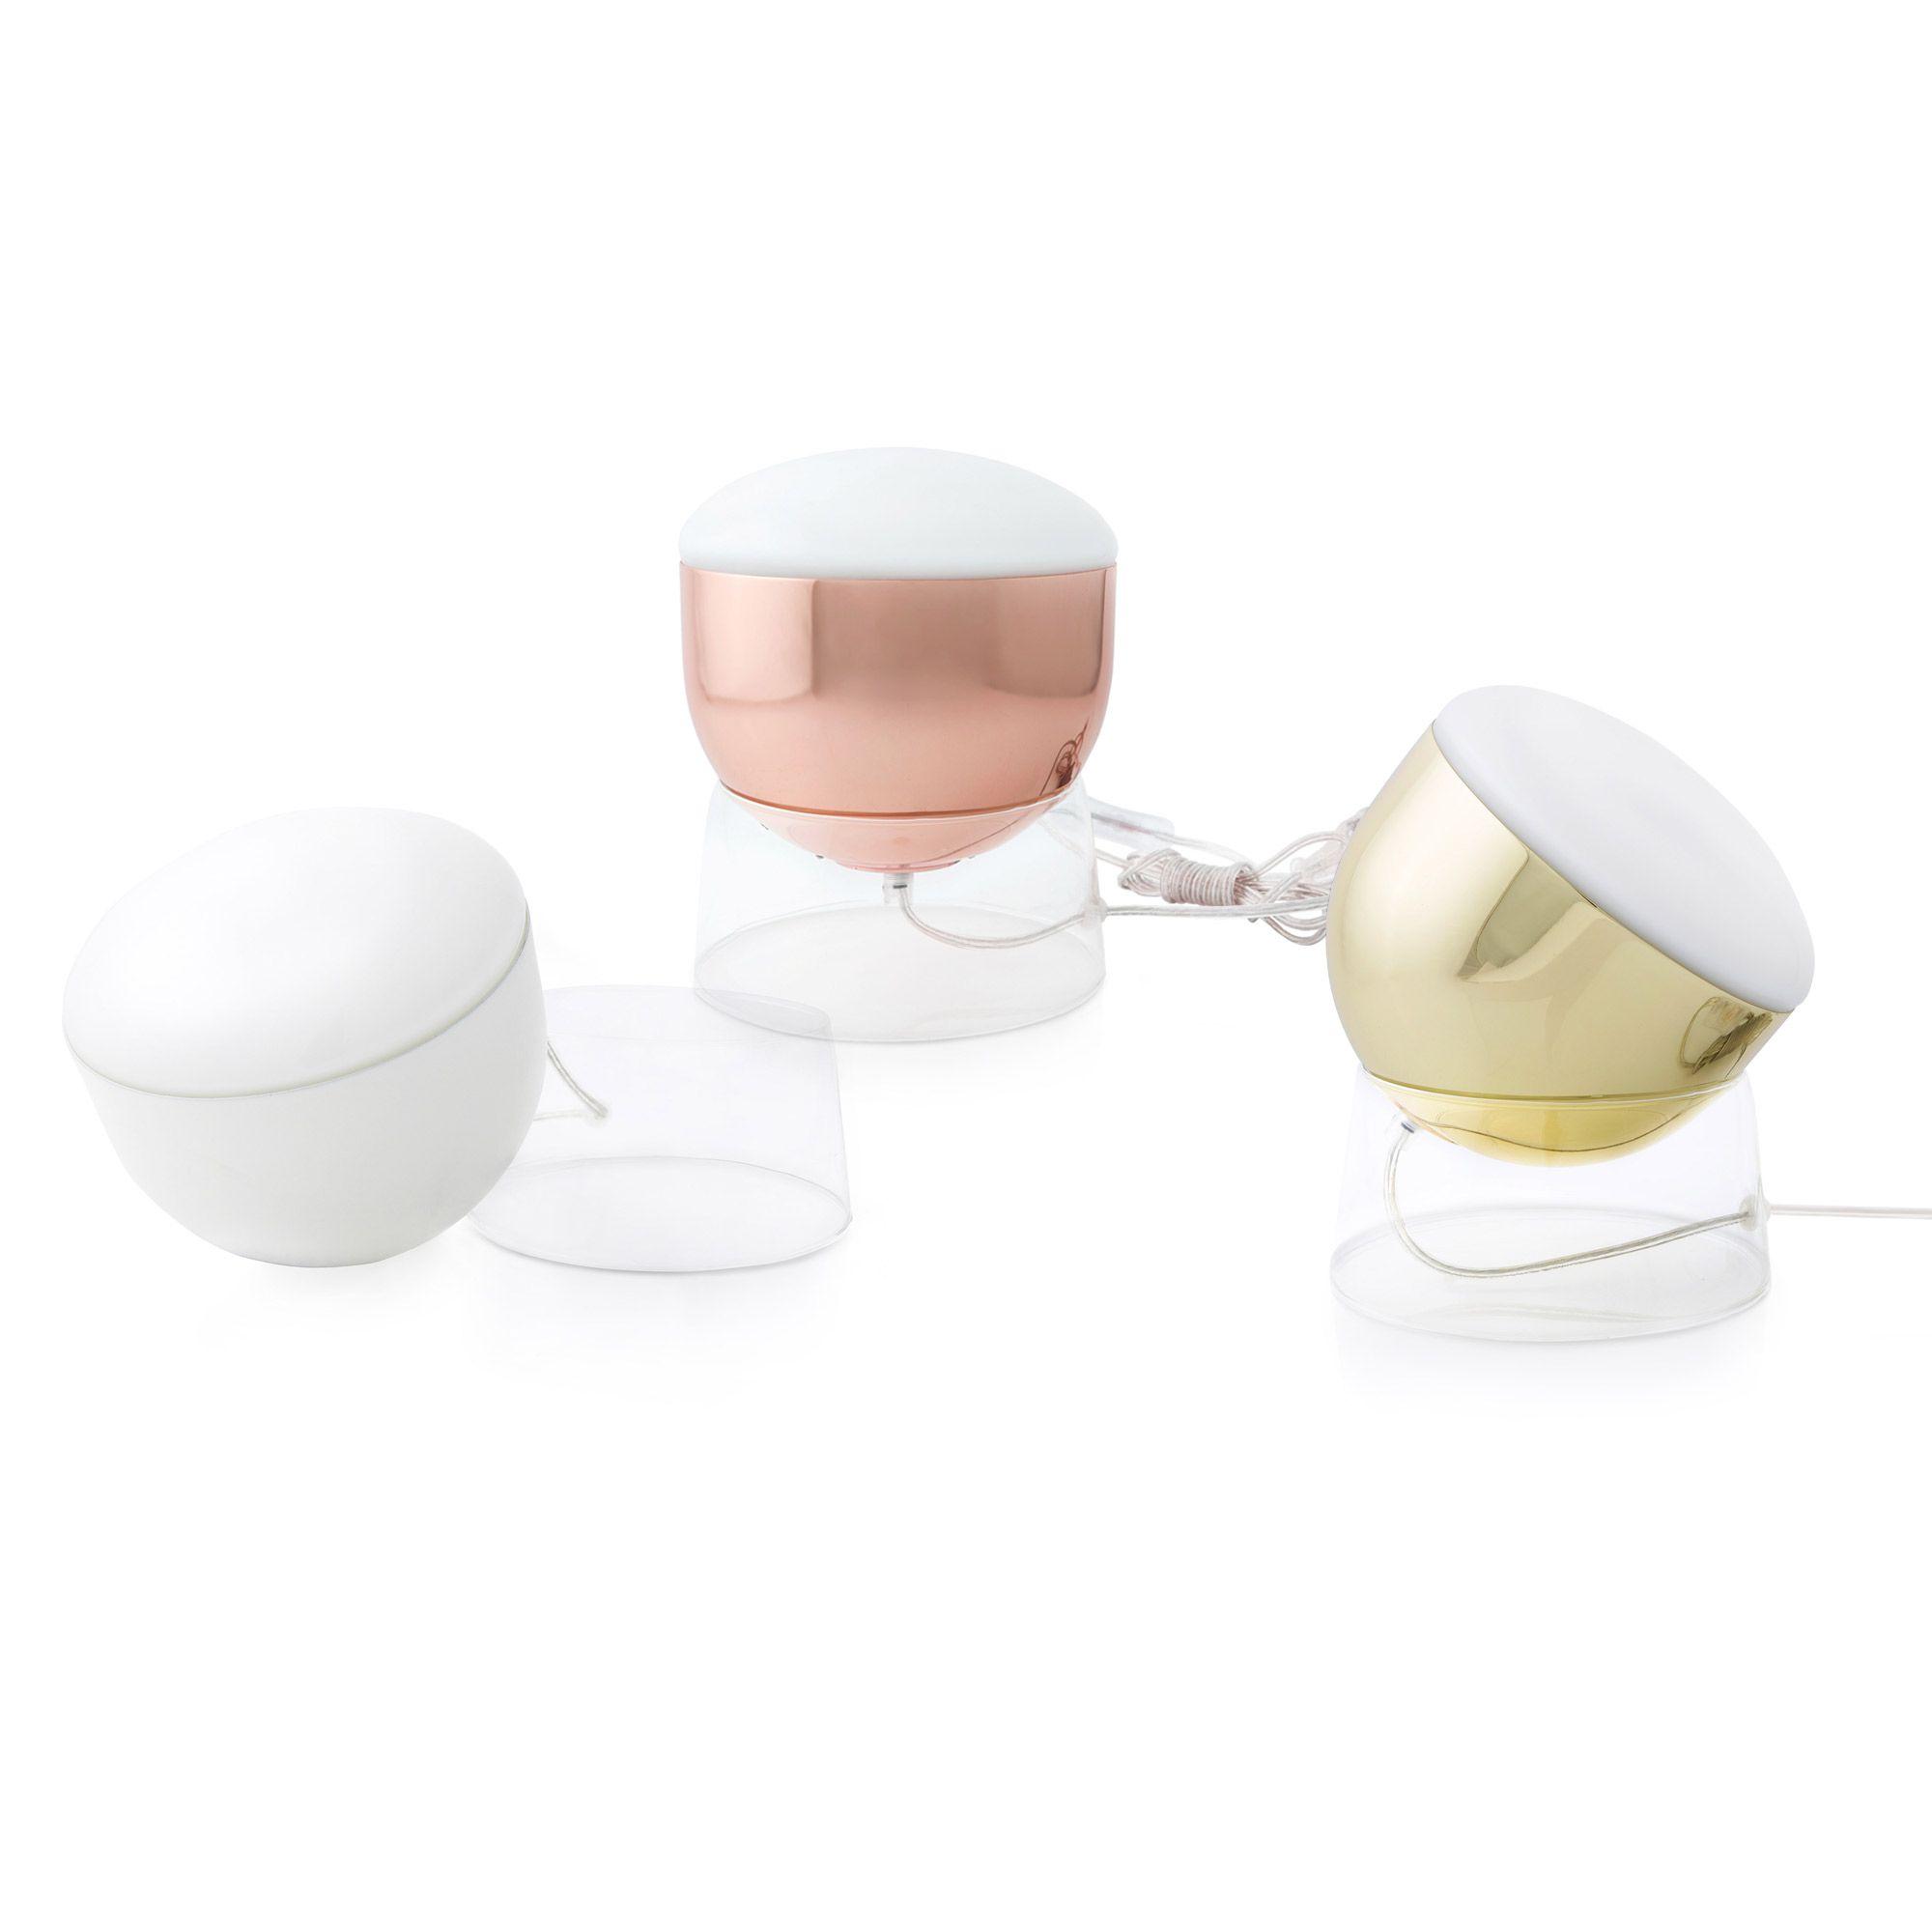 Orientable Transparent Ø18cm Poser À Blancbase Verre Glossy Lampe 9I2eDYHWE